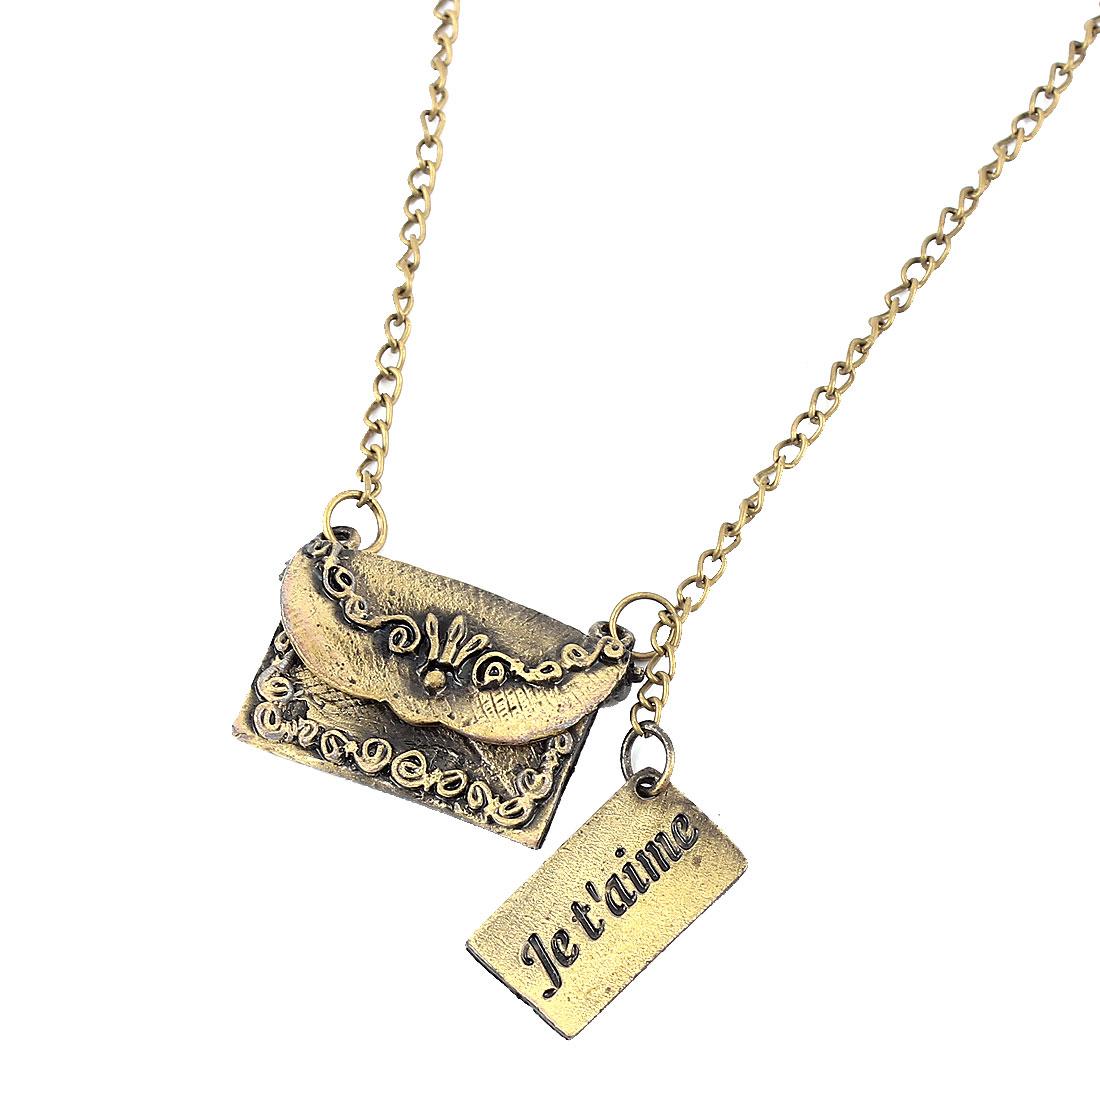 Women Lady Fashion Jewelry Vintage Style Handbag Pendant Necklace Bronze Tone